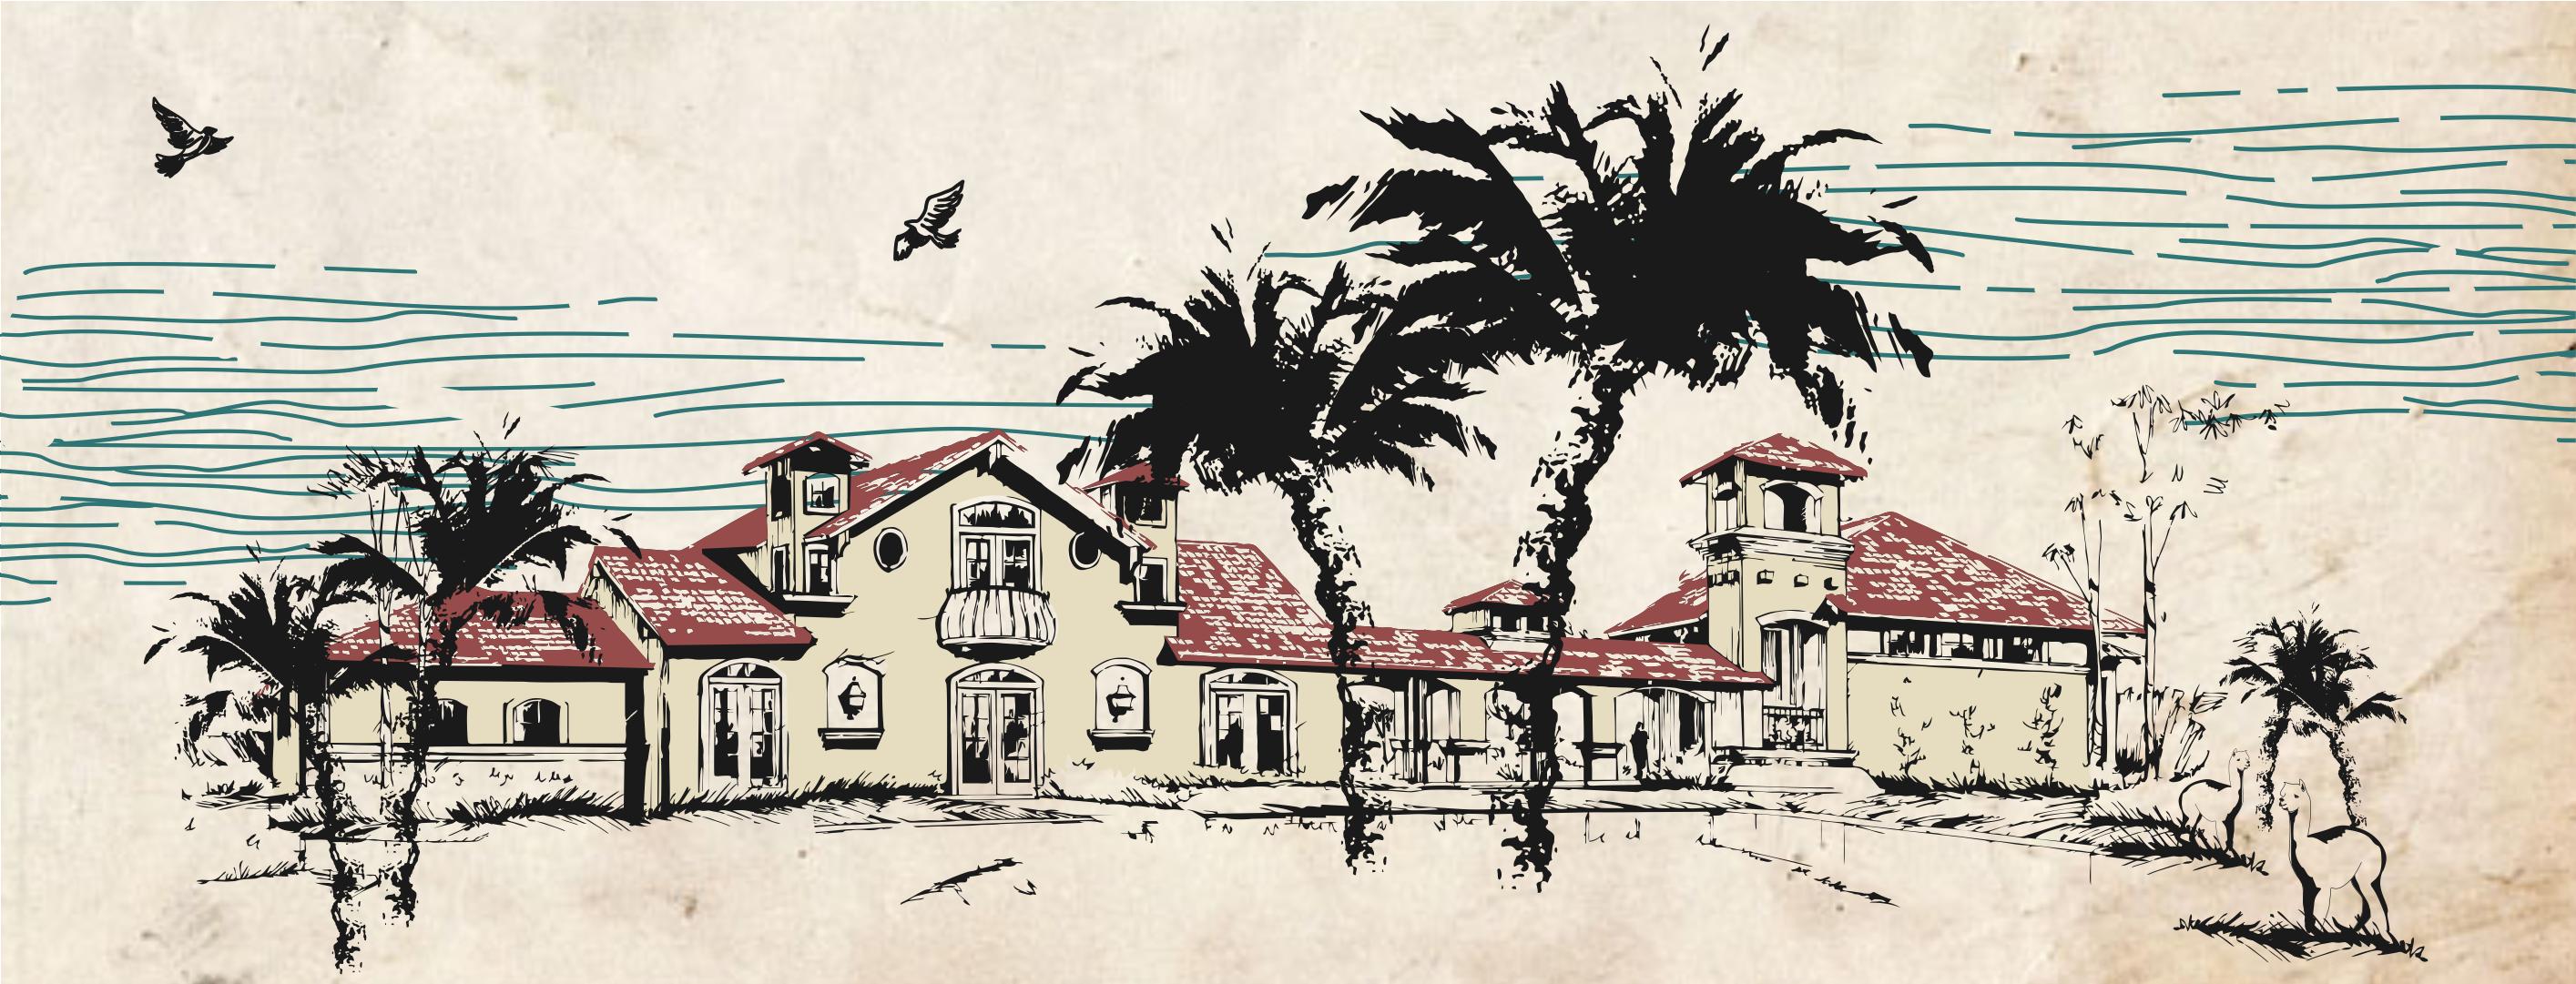 Mission Cabana Artisan Farm logo